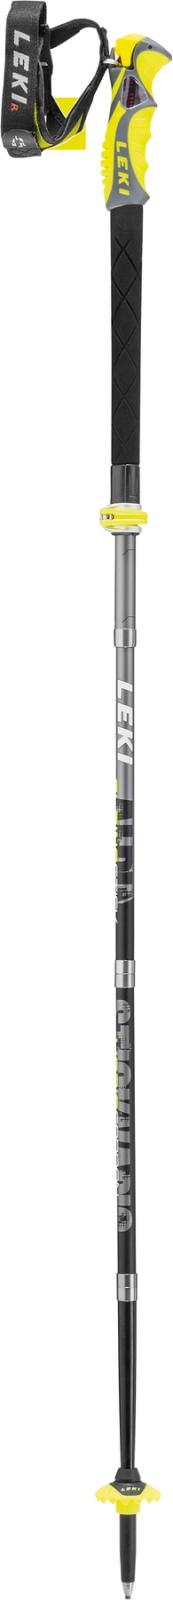 Leki Alpine Stick S Vario